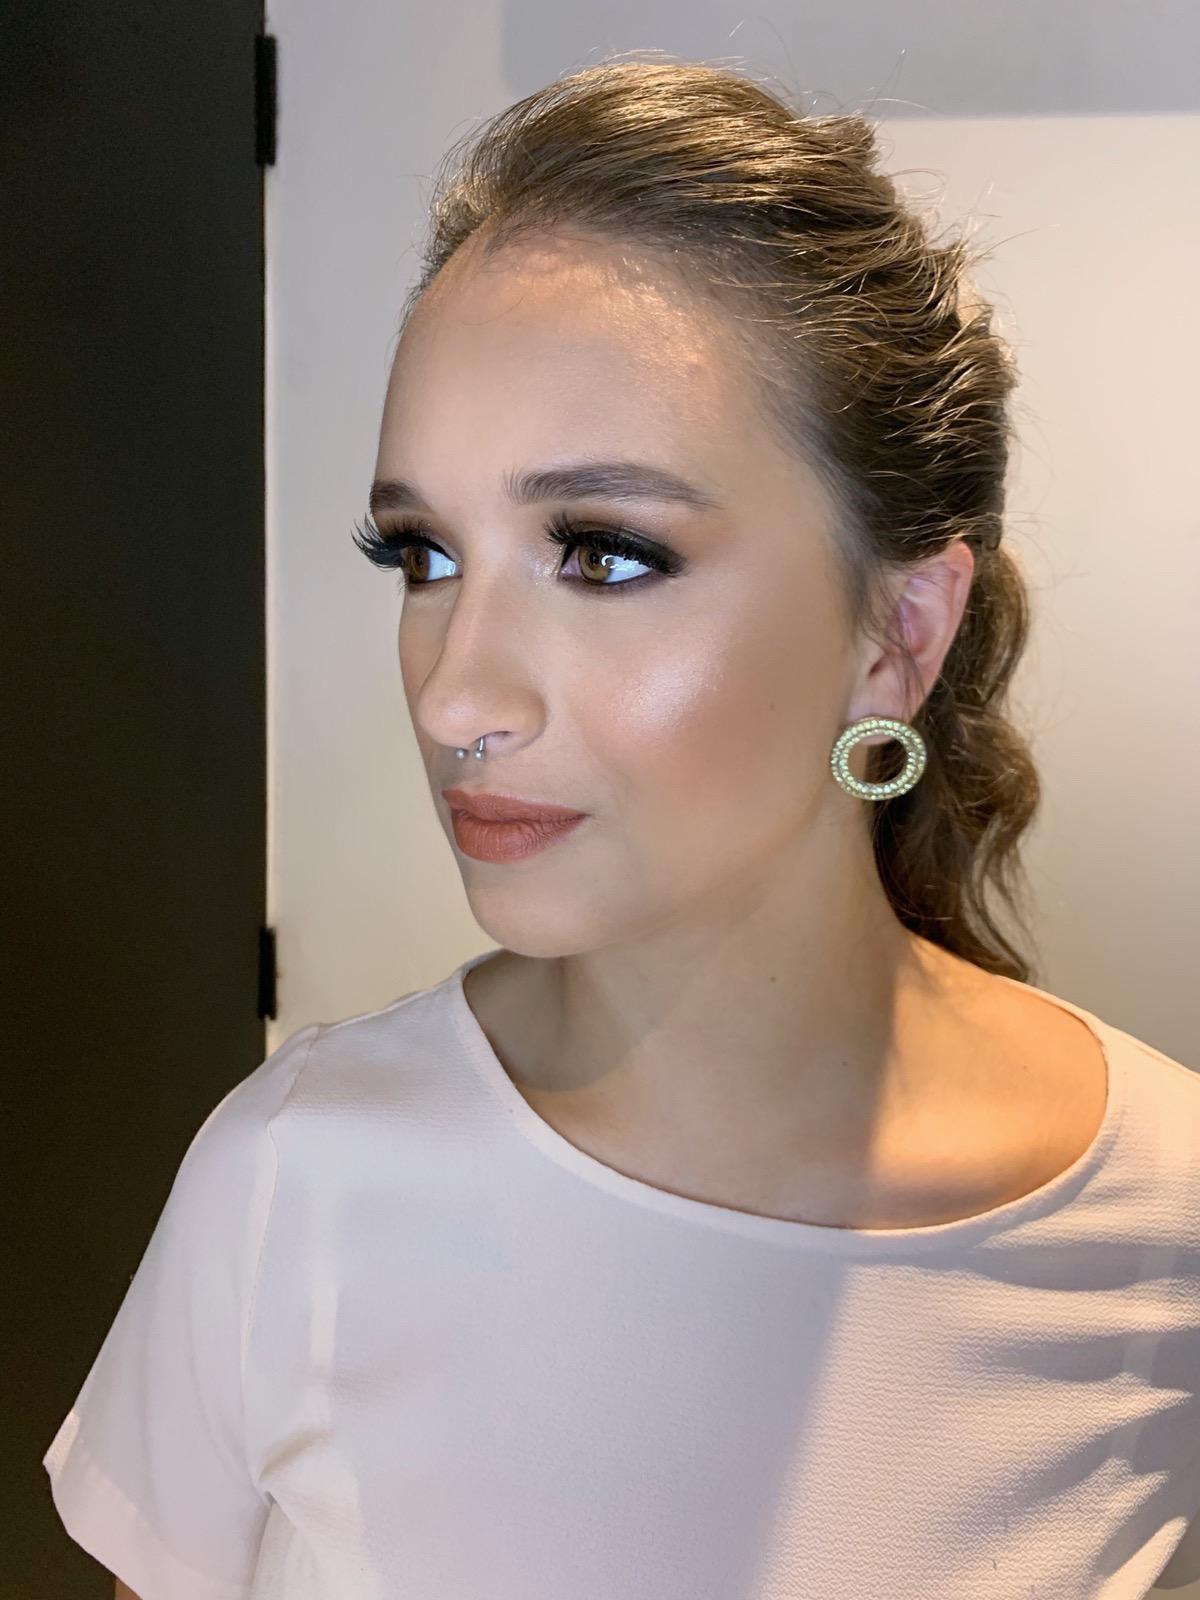 Maquiagem Chique